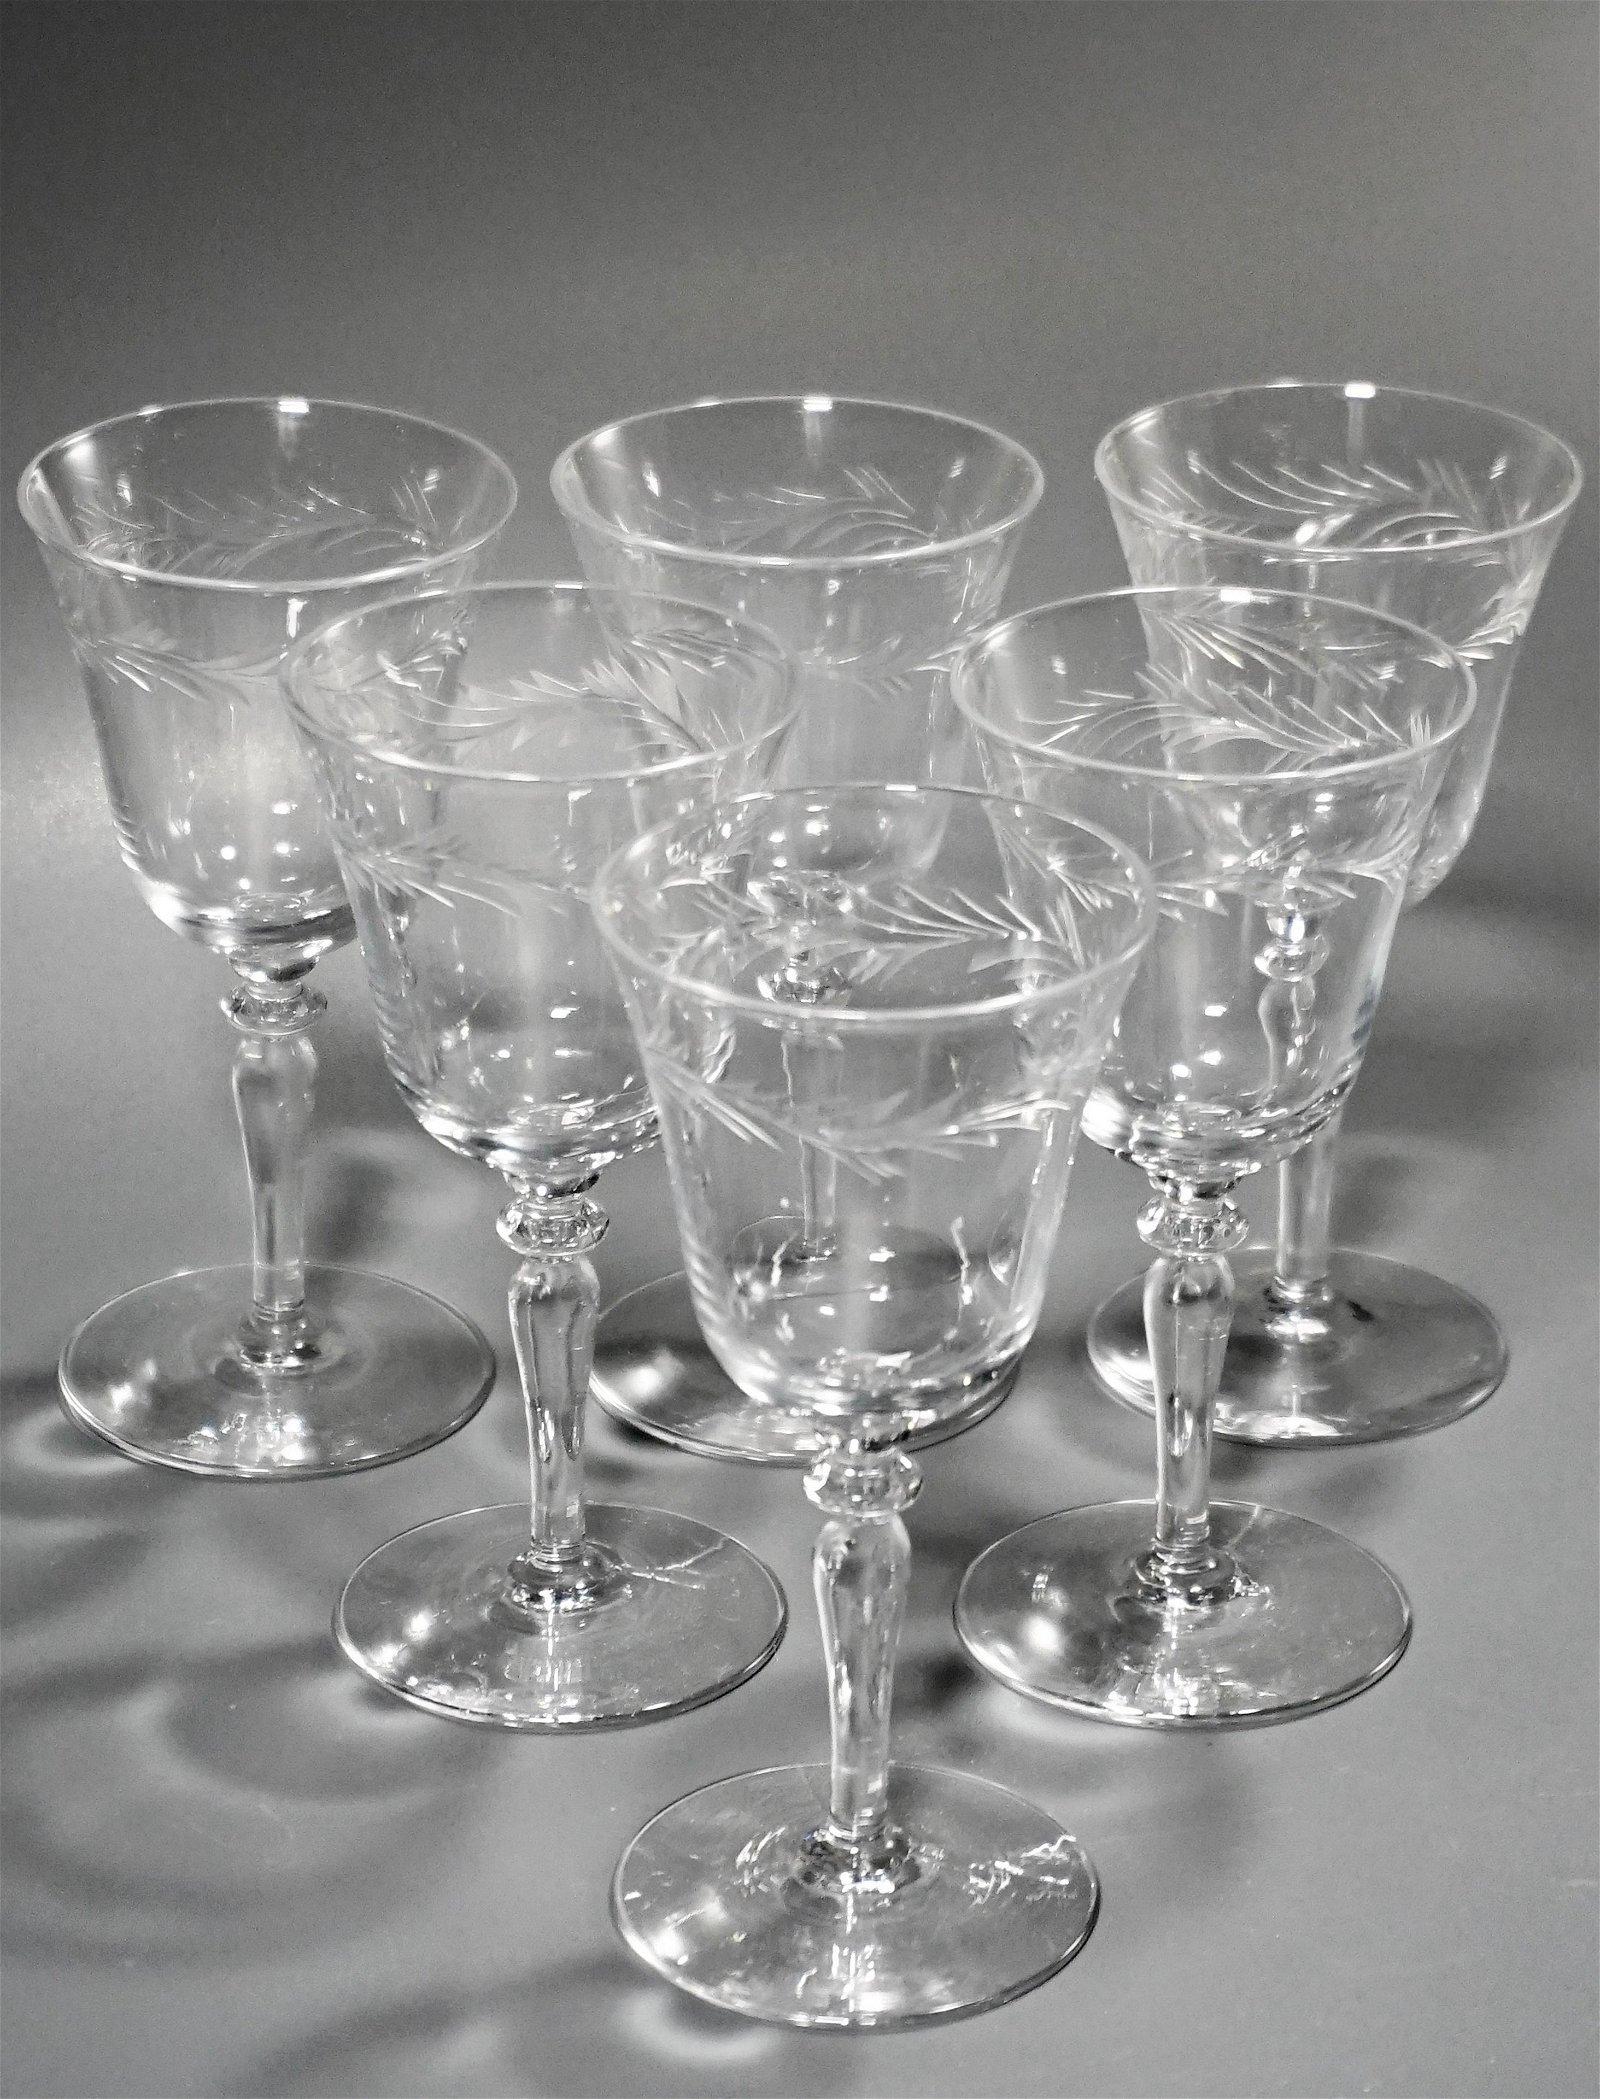 Vintage Elegant Cut Glass Wines Stemware Set of 6